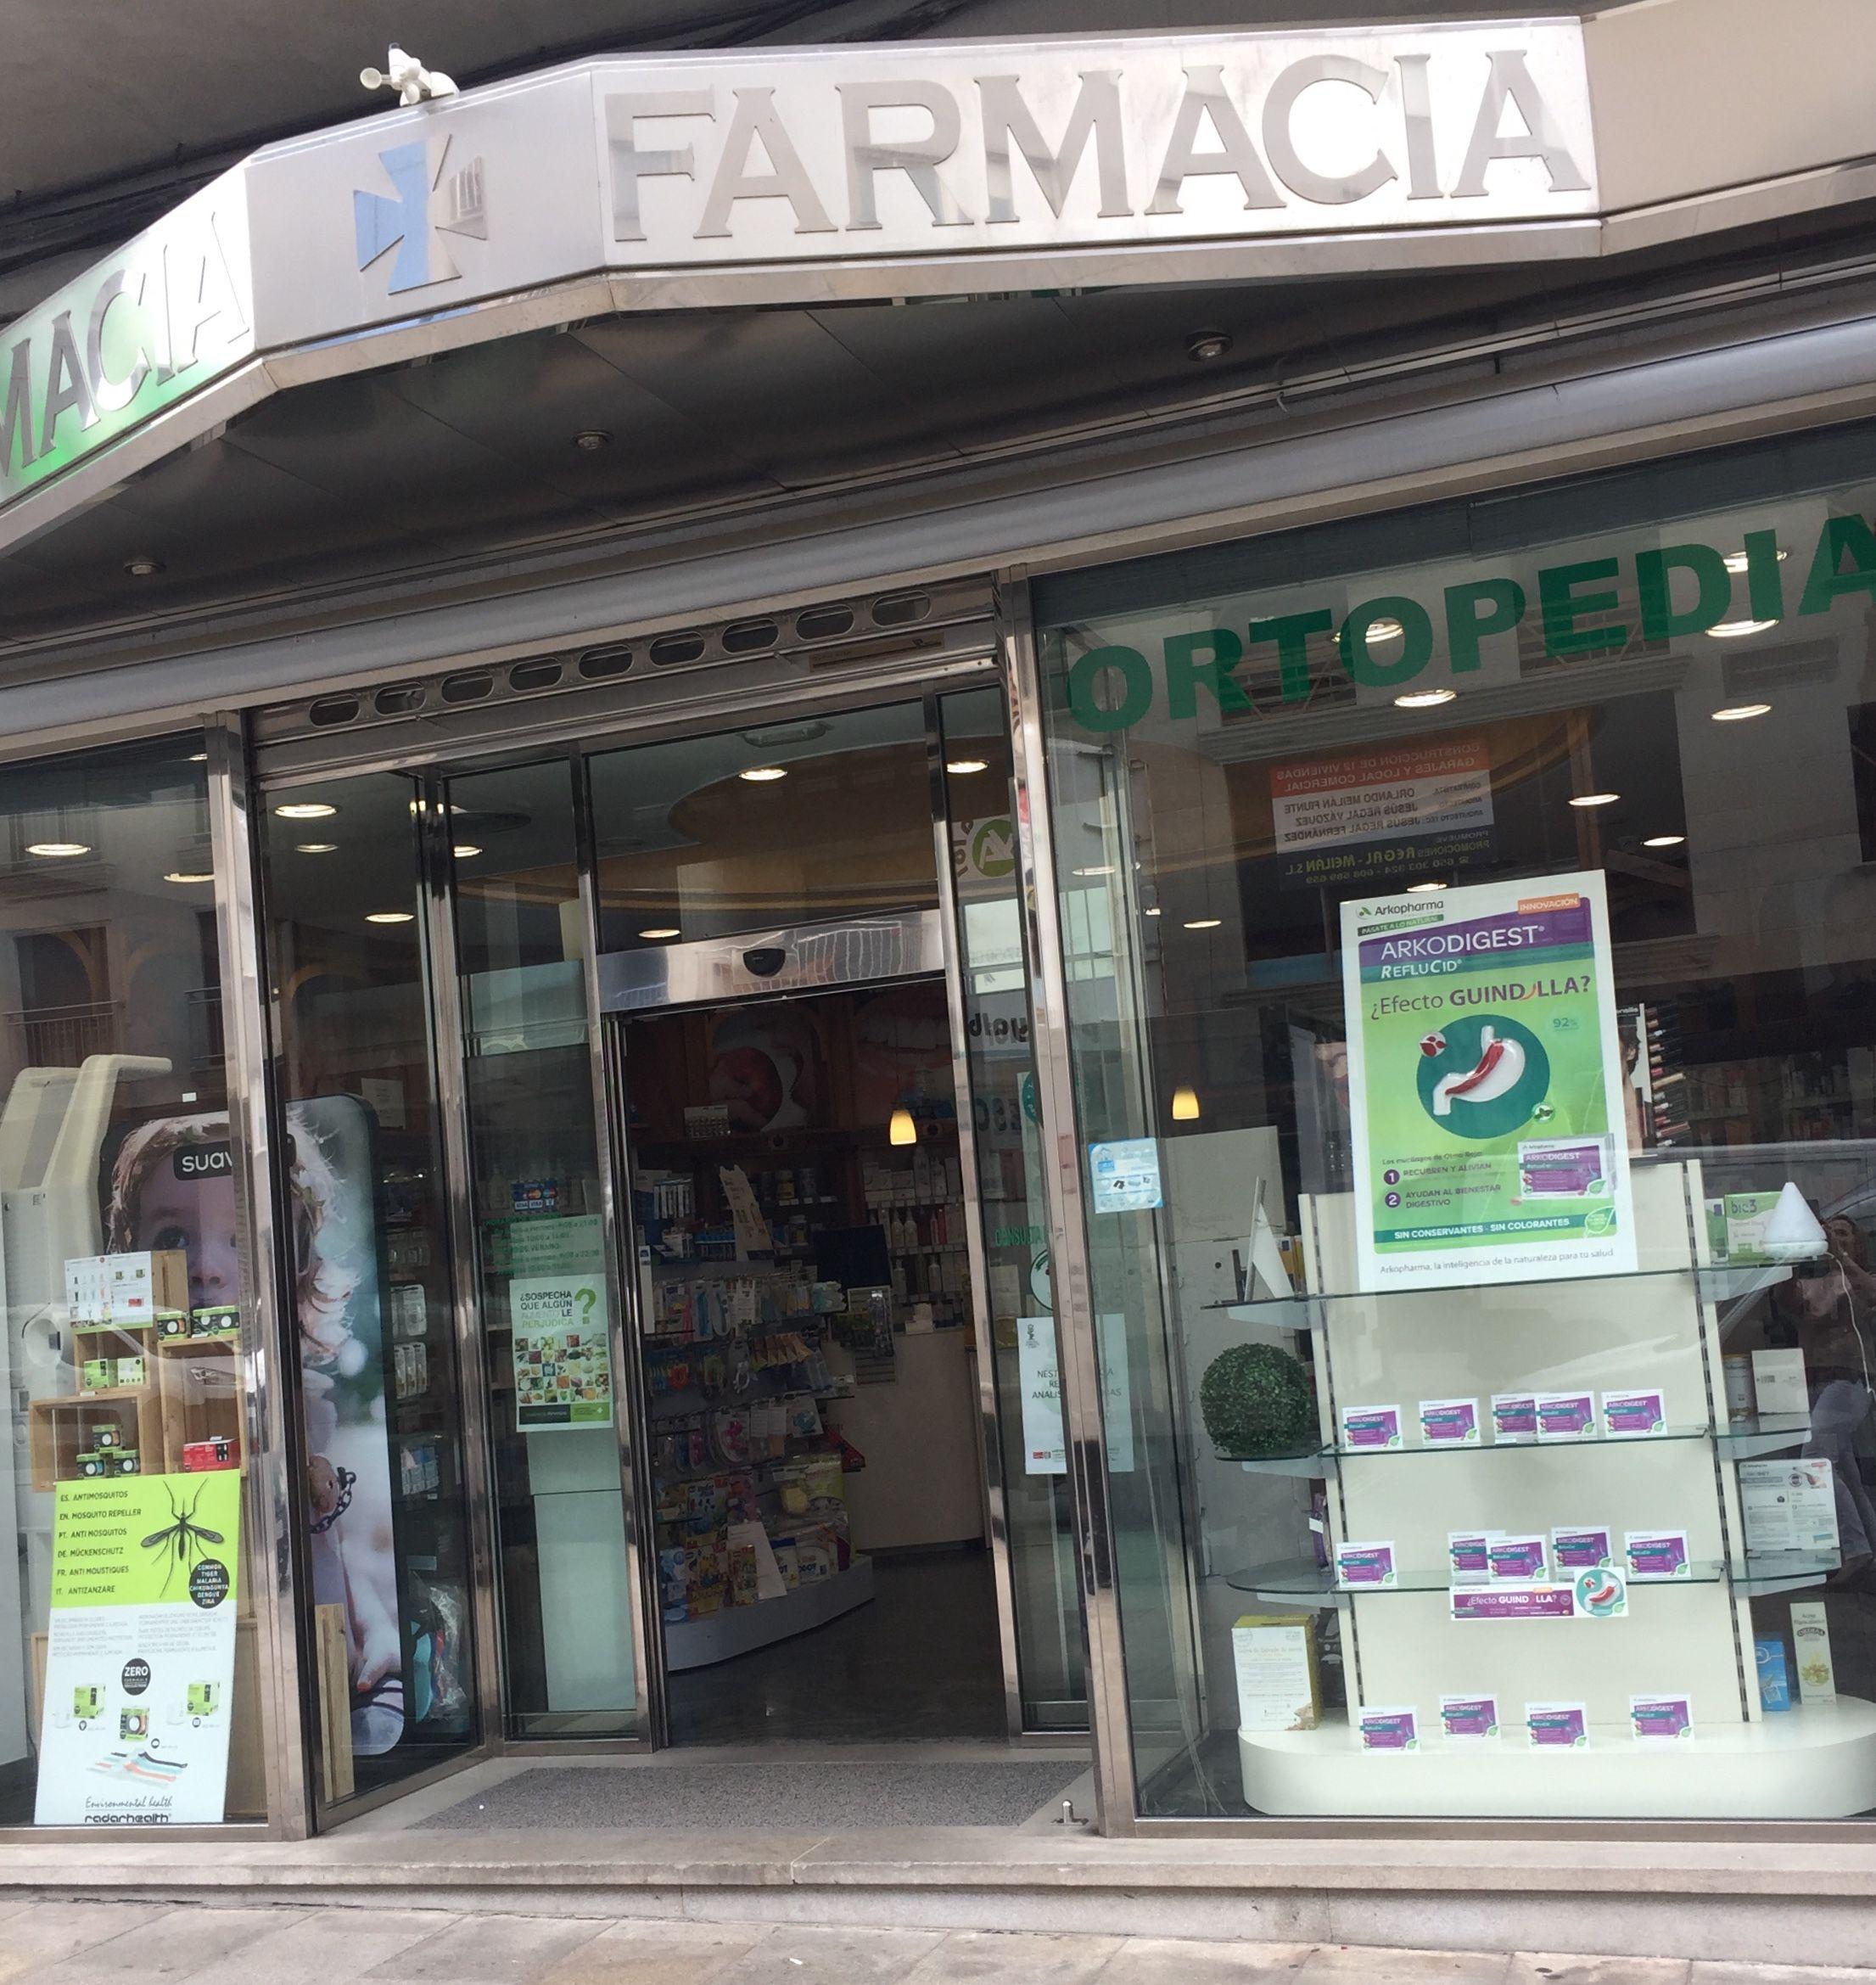 Farmacia con productos de alimentación infantil en Chantada